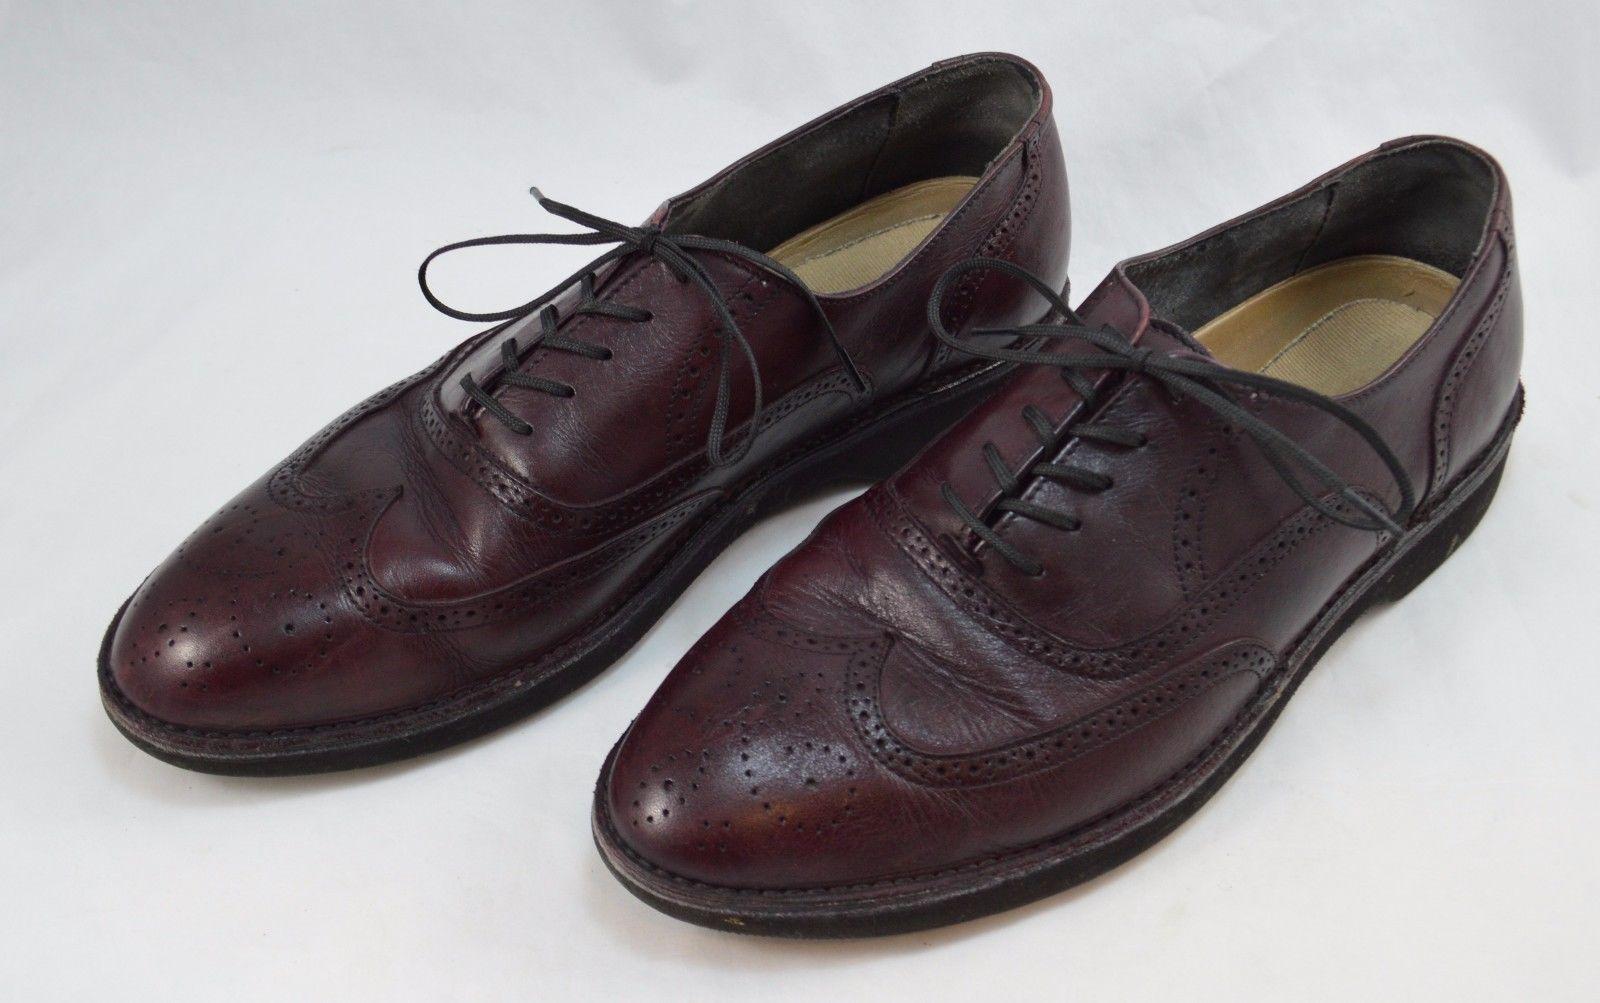 cebacc3711 57. 57. Previous. Rockport Dressports Burgundy Wingtip Brogue Oxford Vibram Shoes  Mens 9.5M ...